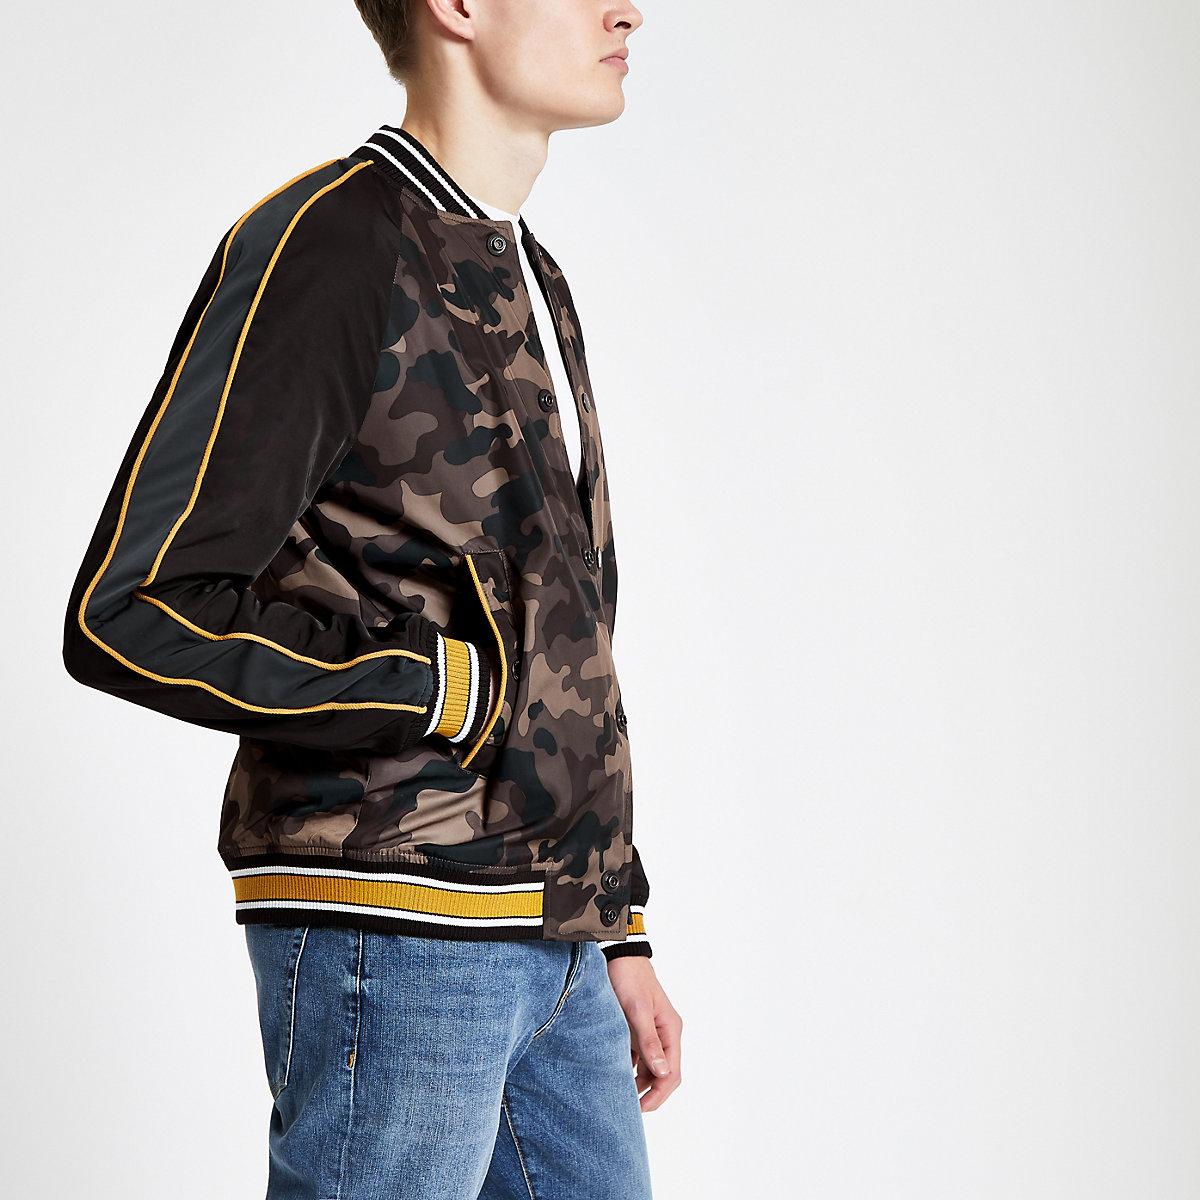 Superdry brown camo baseball jacket